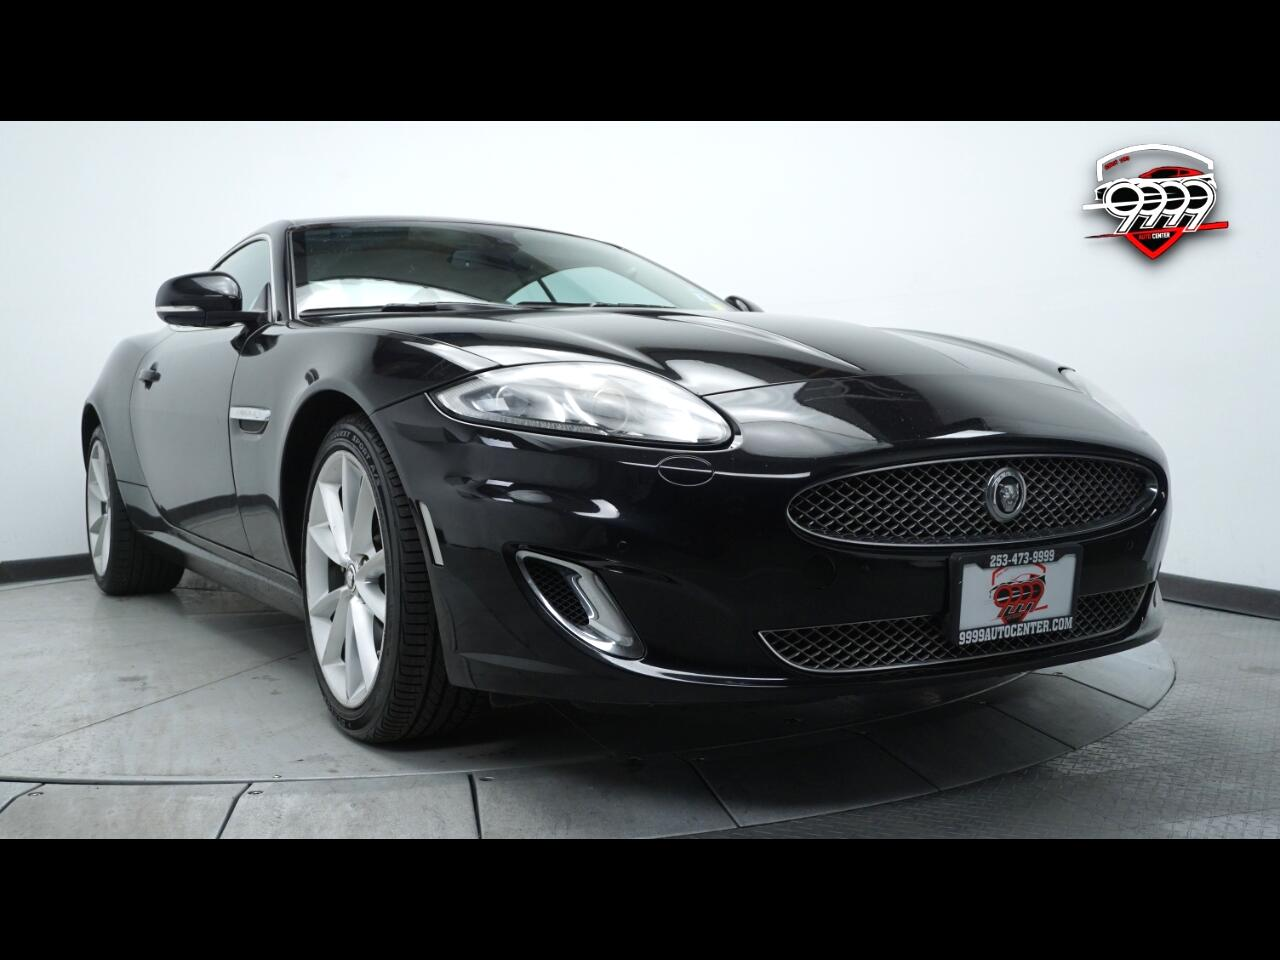 Jaguar XK-Series XK Coupe 2013